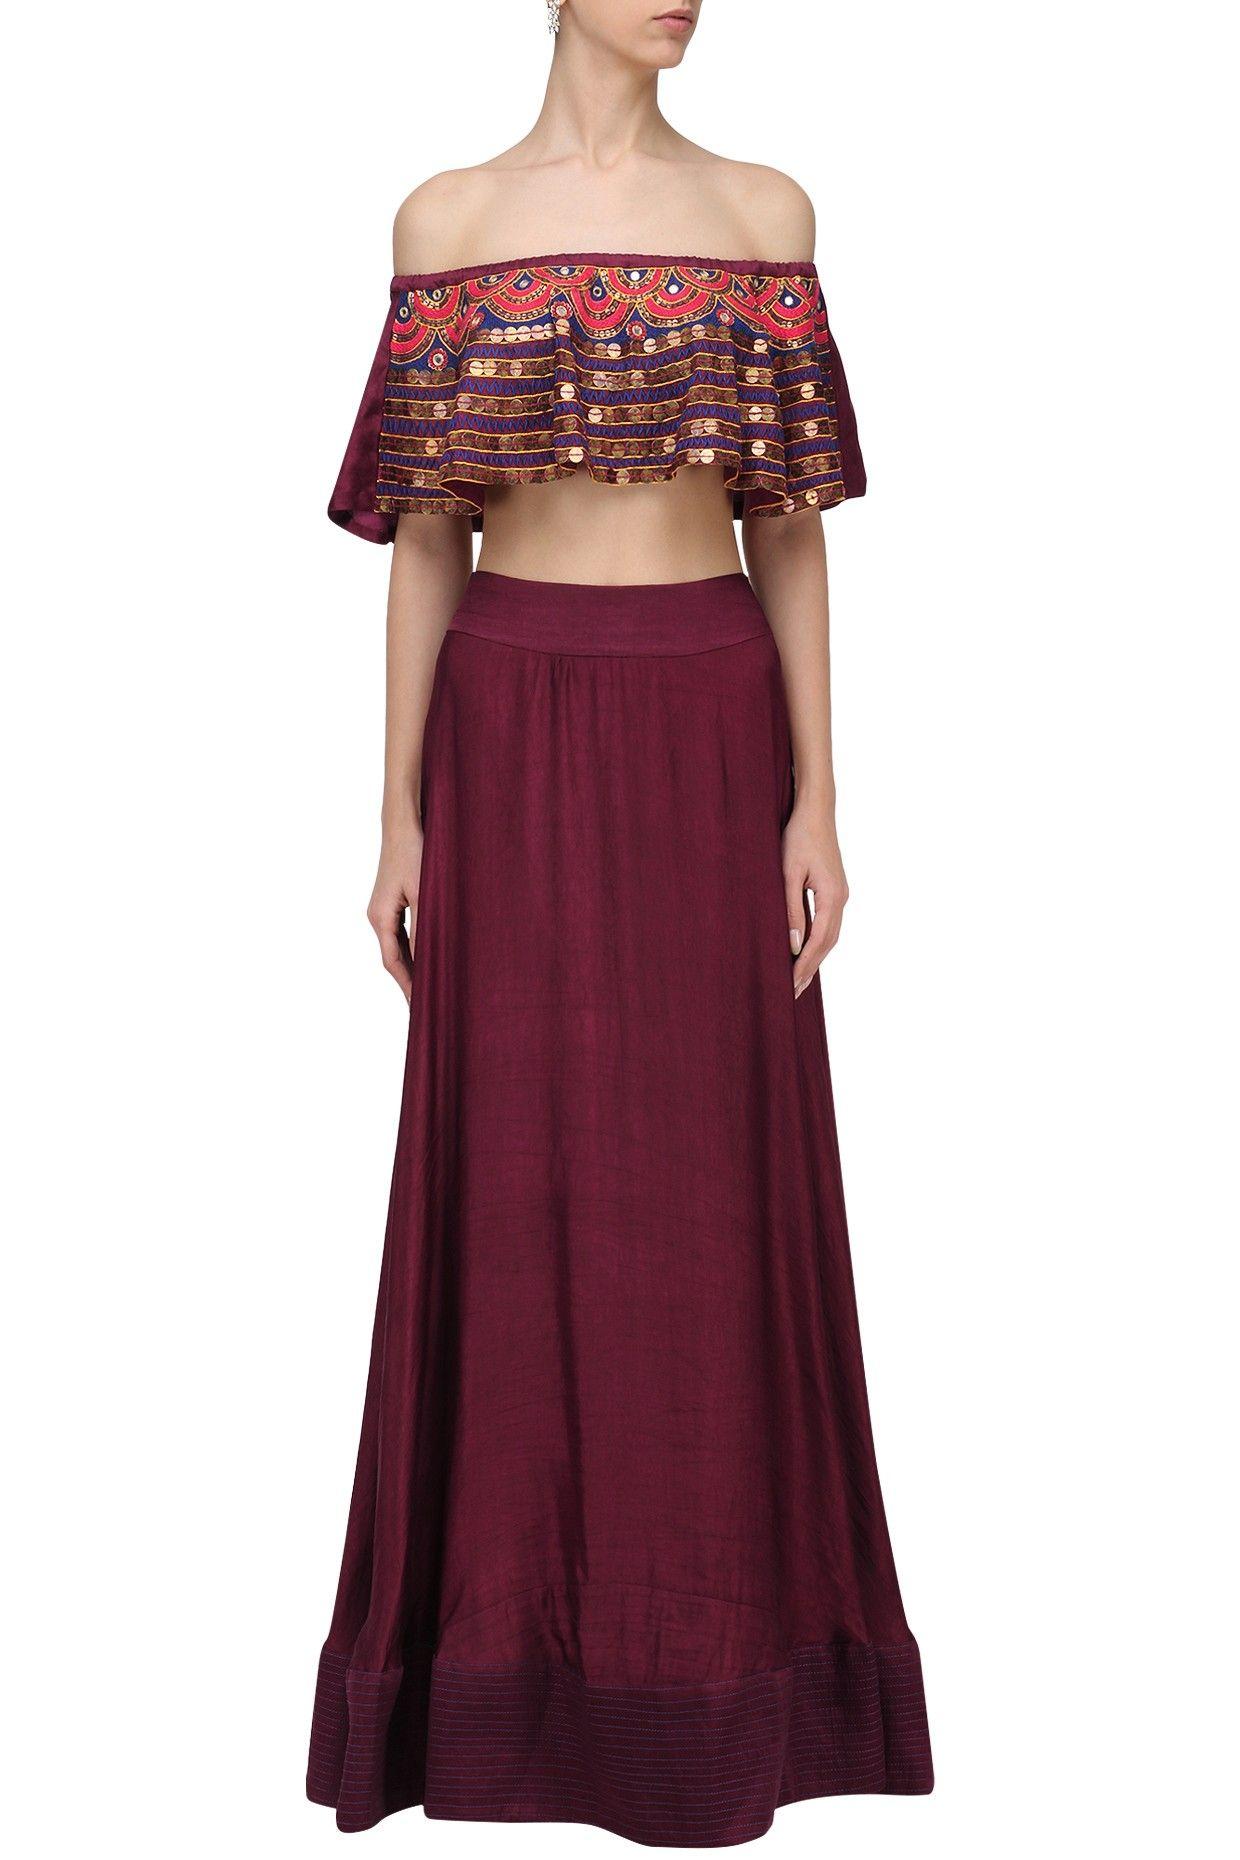 d7ff154a519 ROSHNI CHOPRA Burgundy Embroidered Off Shoulder Top and Skirt Set. Shop Now!   roshnichopra  ethnic  burgundy  skirt  embroidered  indianfashion ...